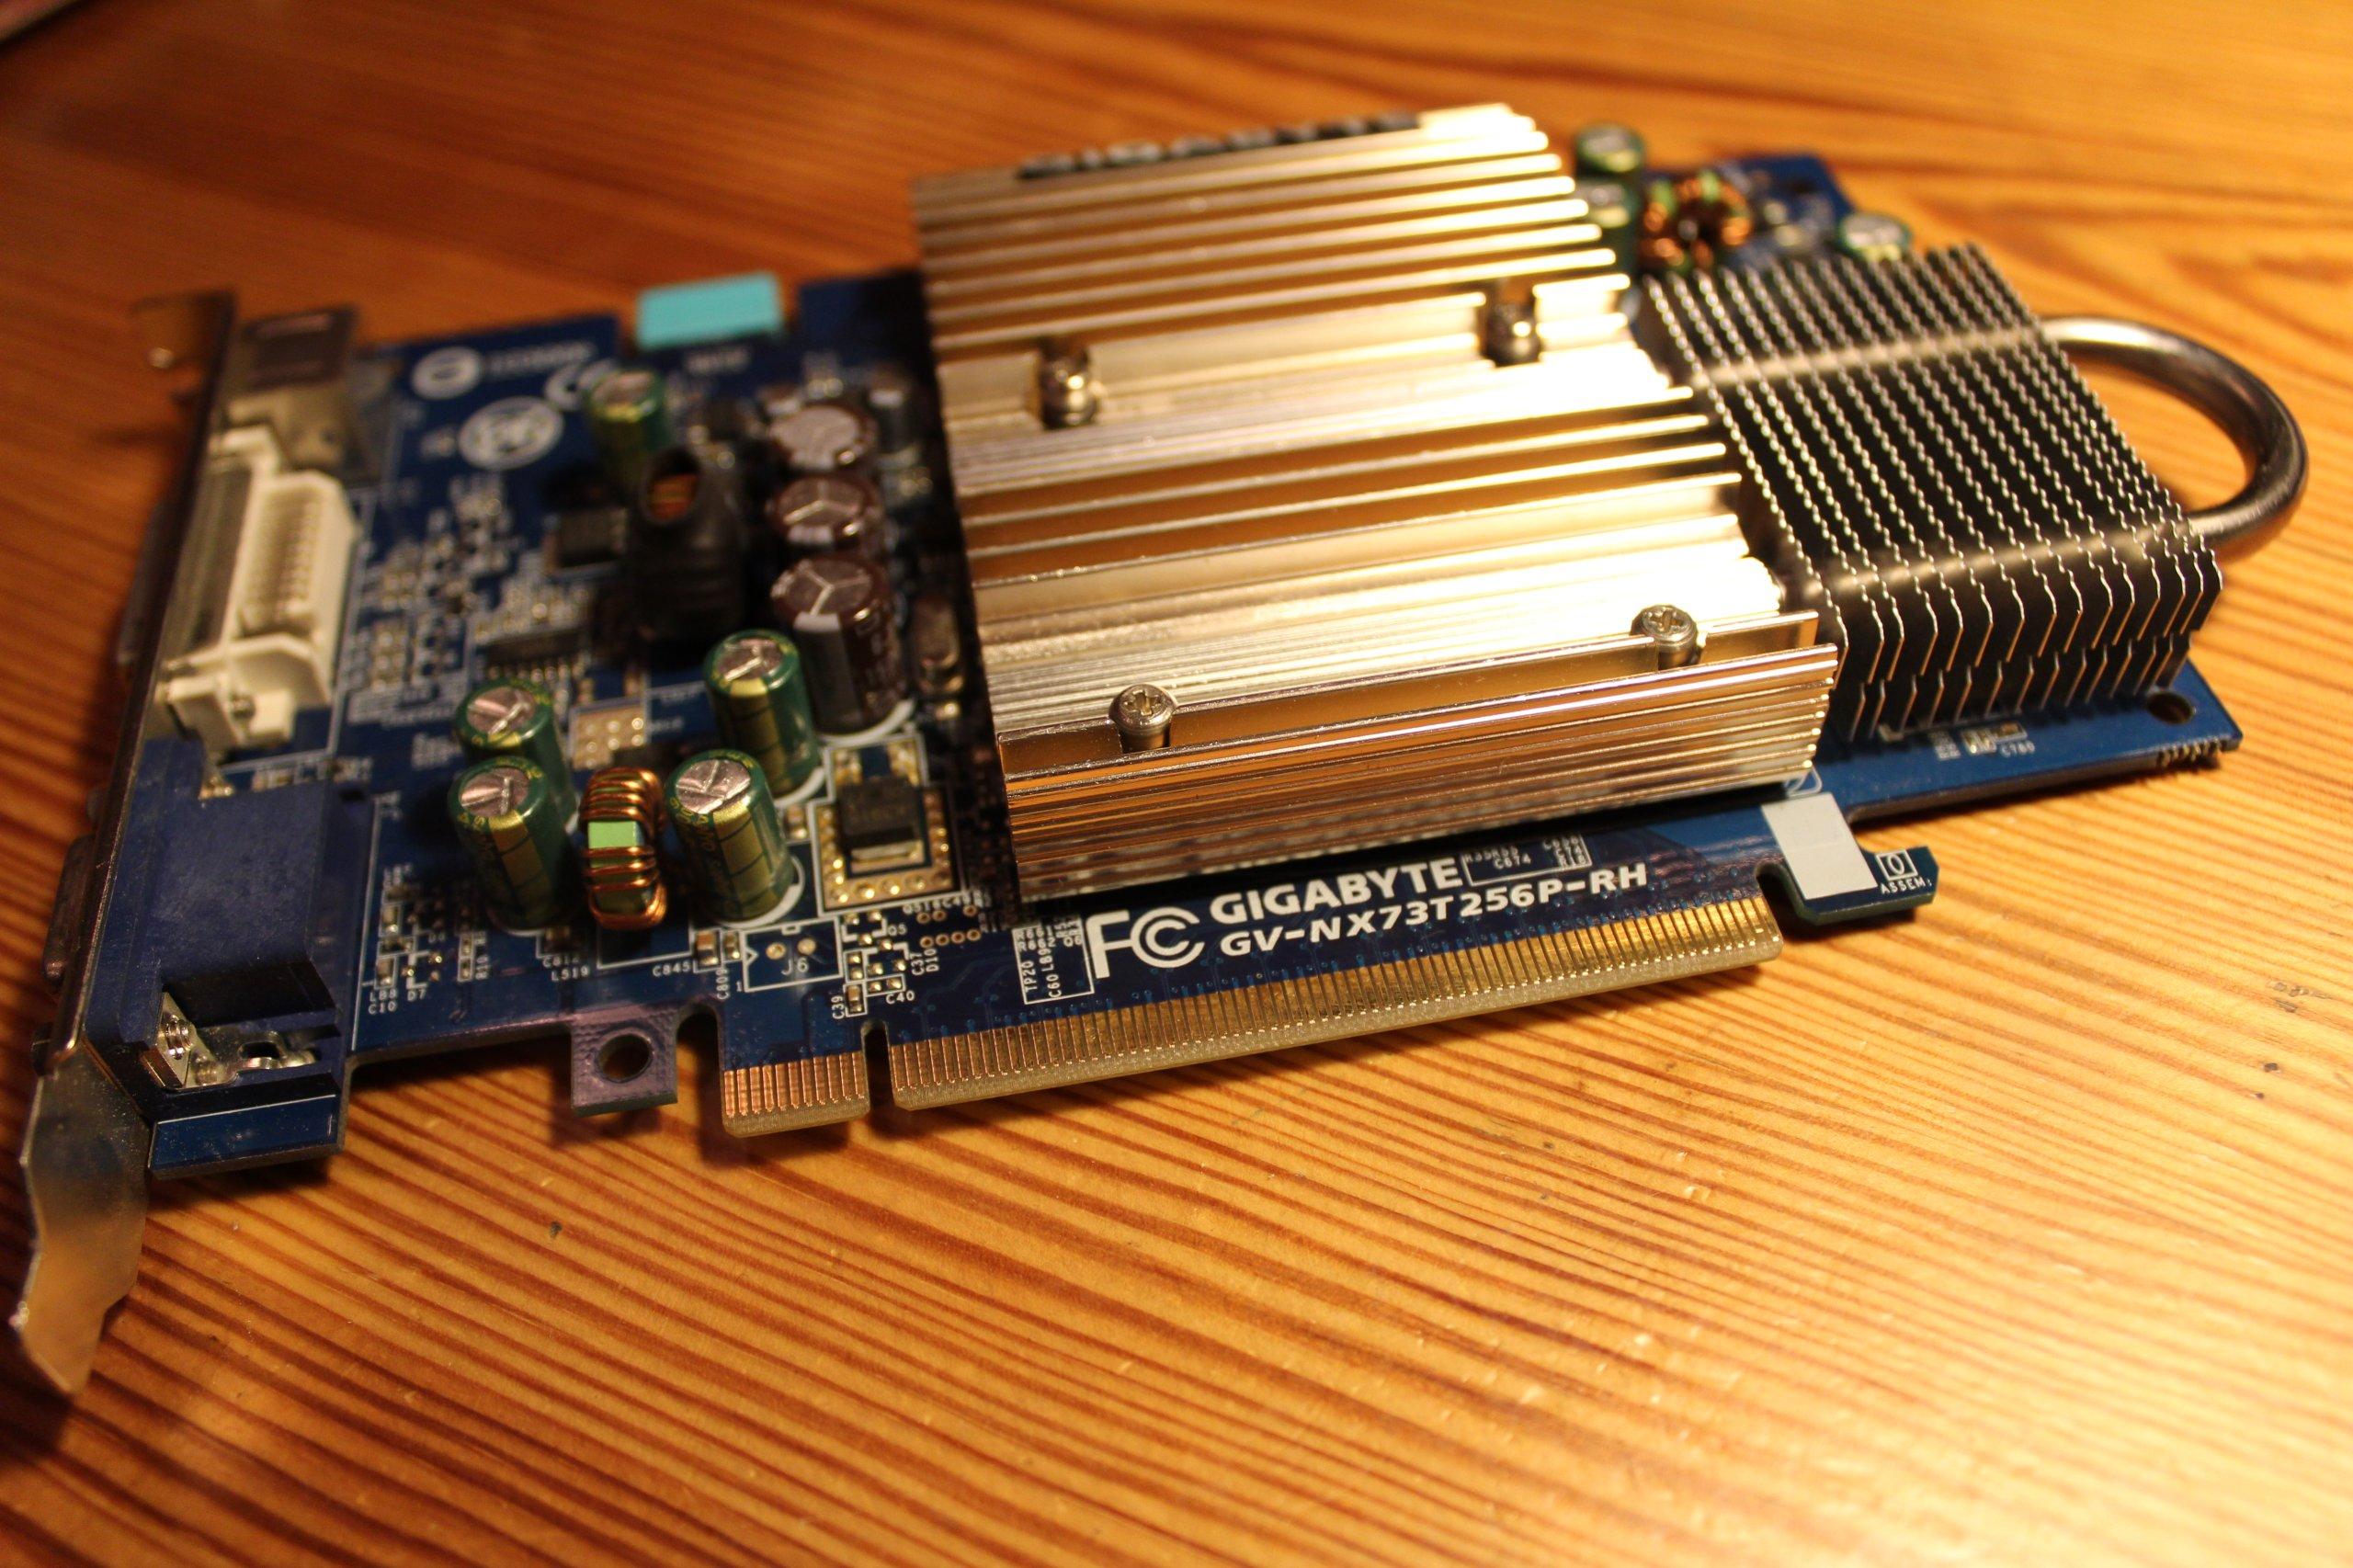 GIGABYTE GV-NX73T256P-RH GEFORCE 7300 GT DRIVER FOR PC